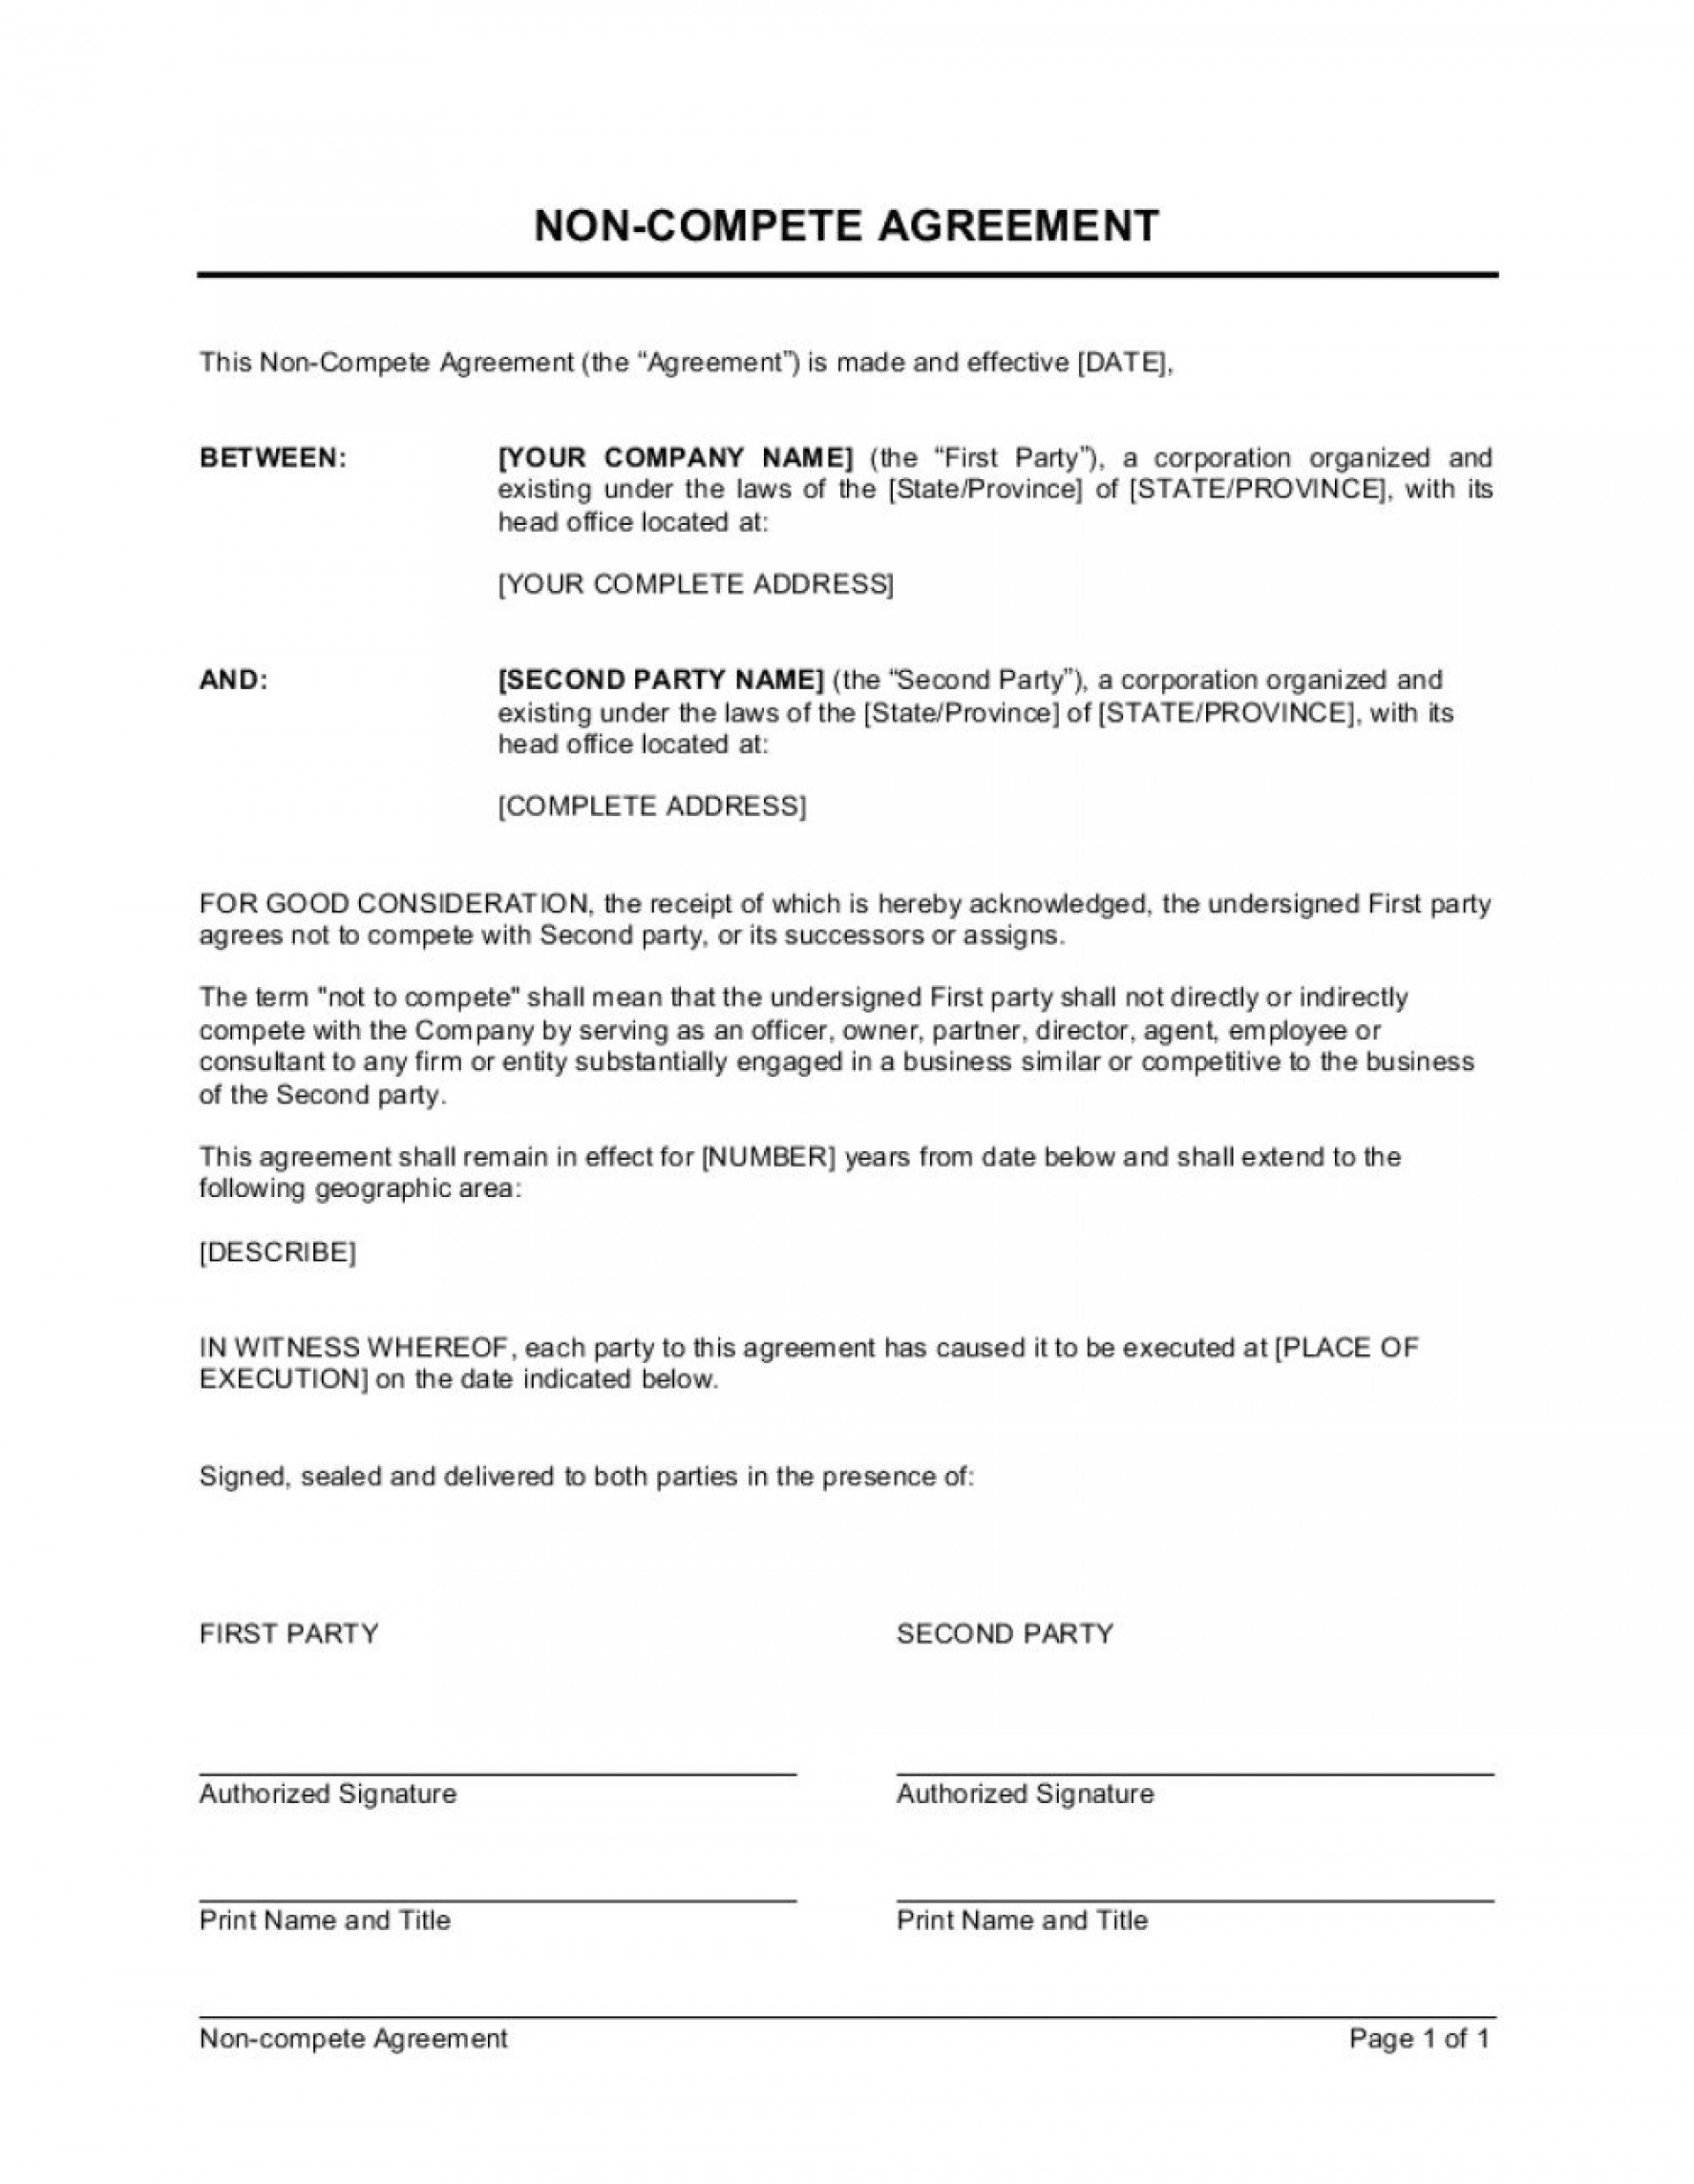 001 Wonderful Non Compete Agreement Template Idea  Sample India Free Florida1920